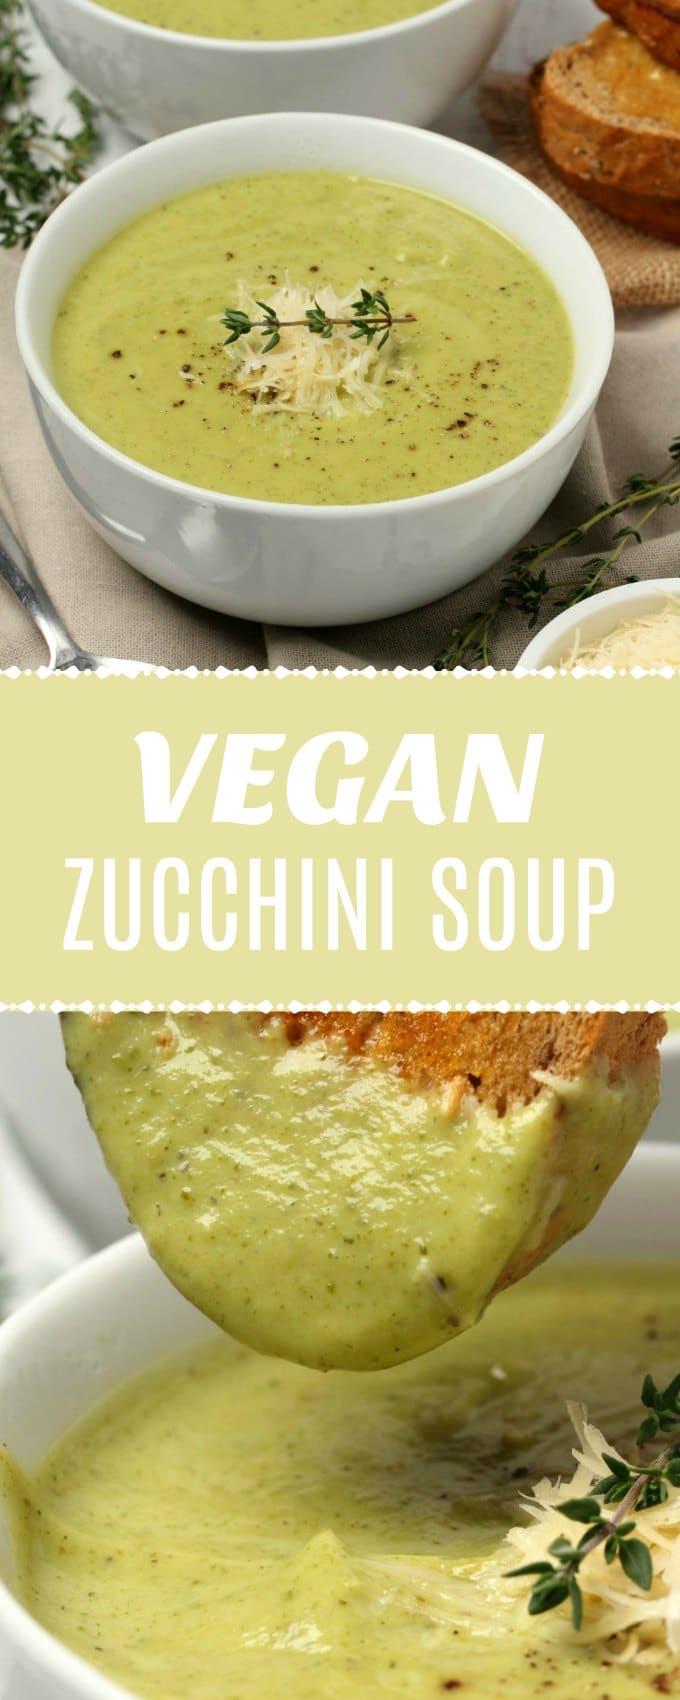 Ultra creamy vegan zucchini soup. This simple 9-ingredient recipe is ready in 30 minutes and crazy delicious. It's also gluten-free.#vegan #dairyfree #glutenfree #soup | lovingitvegan.com